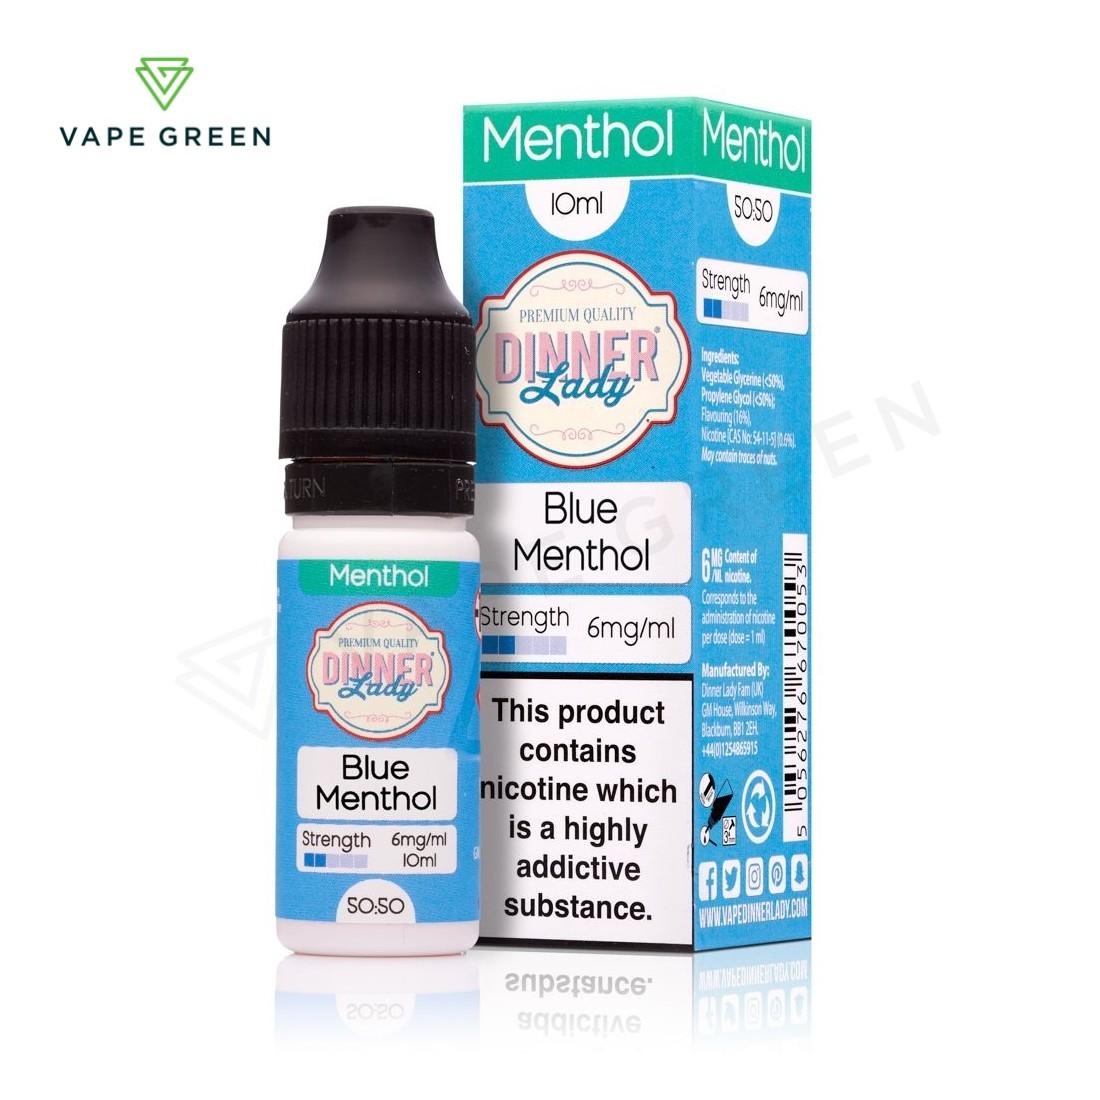 Blue Menthol E-Liquid by Dinner Lady Menthol 50/50